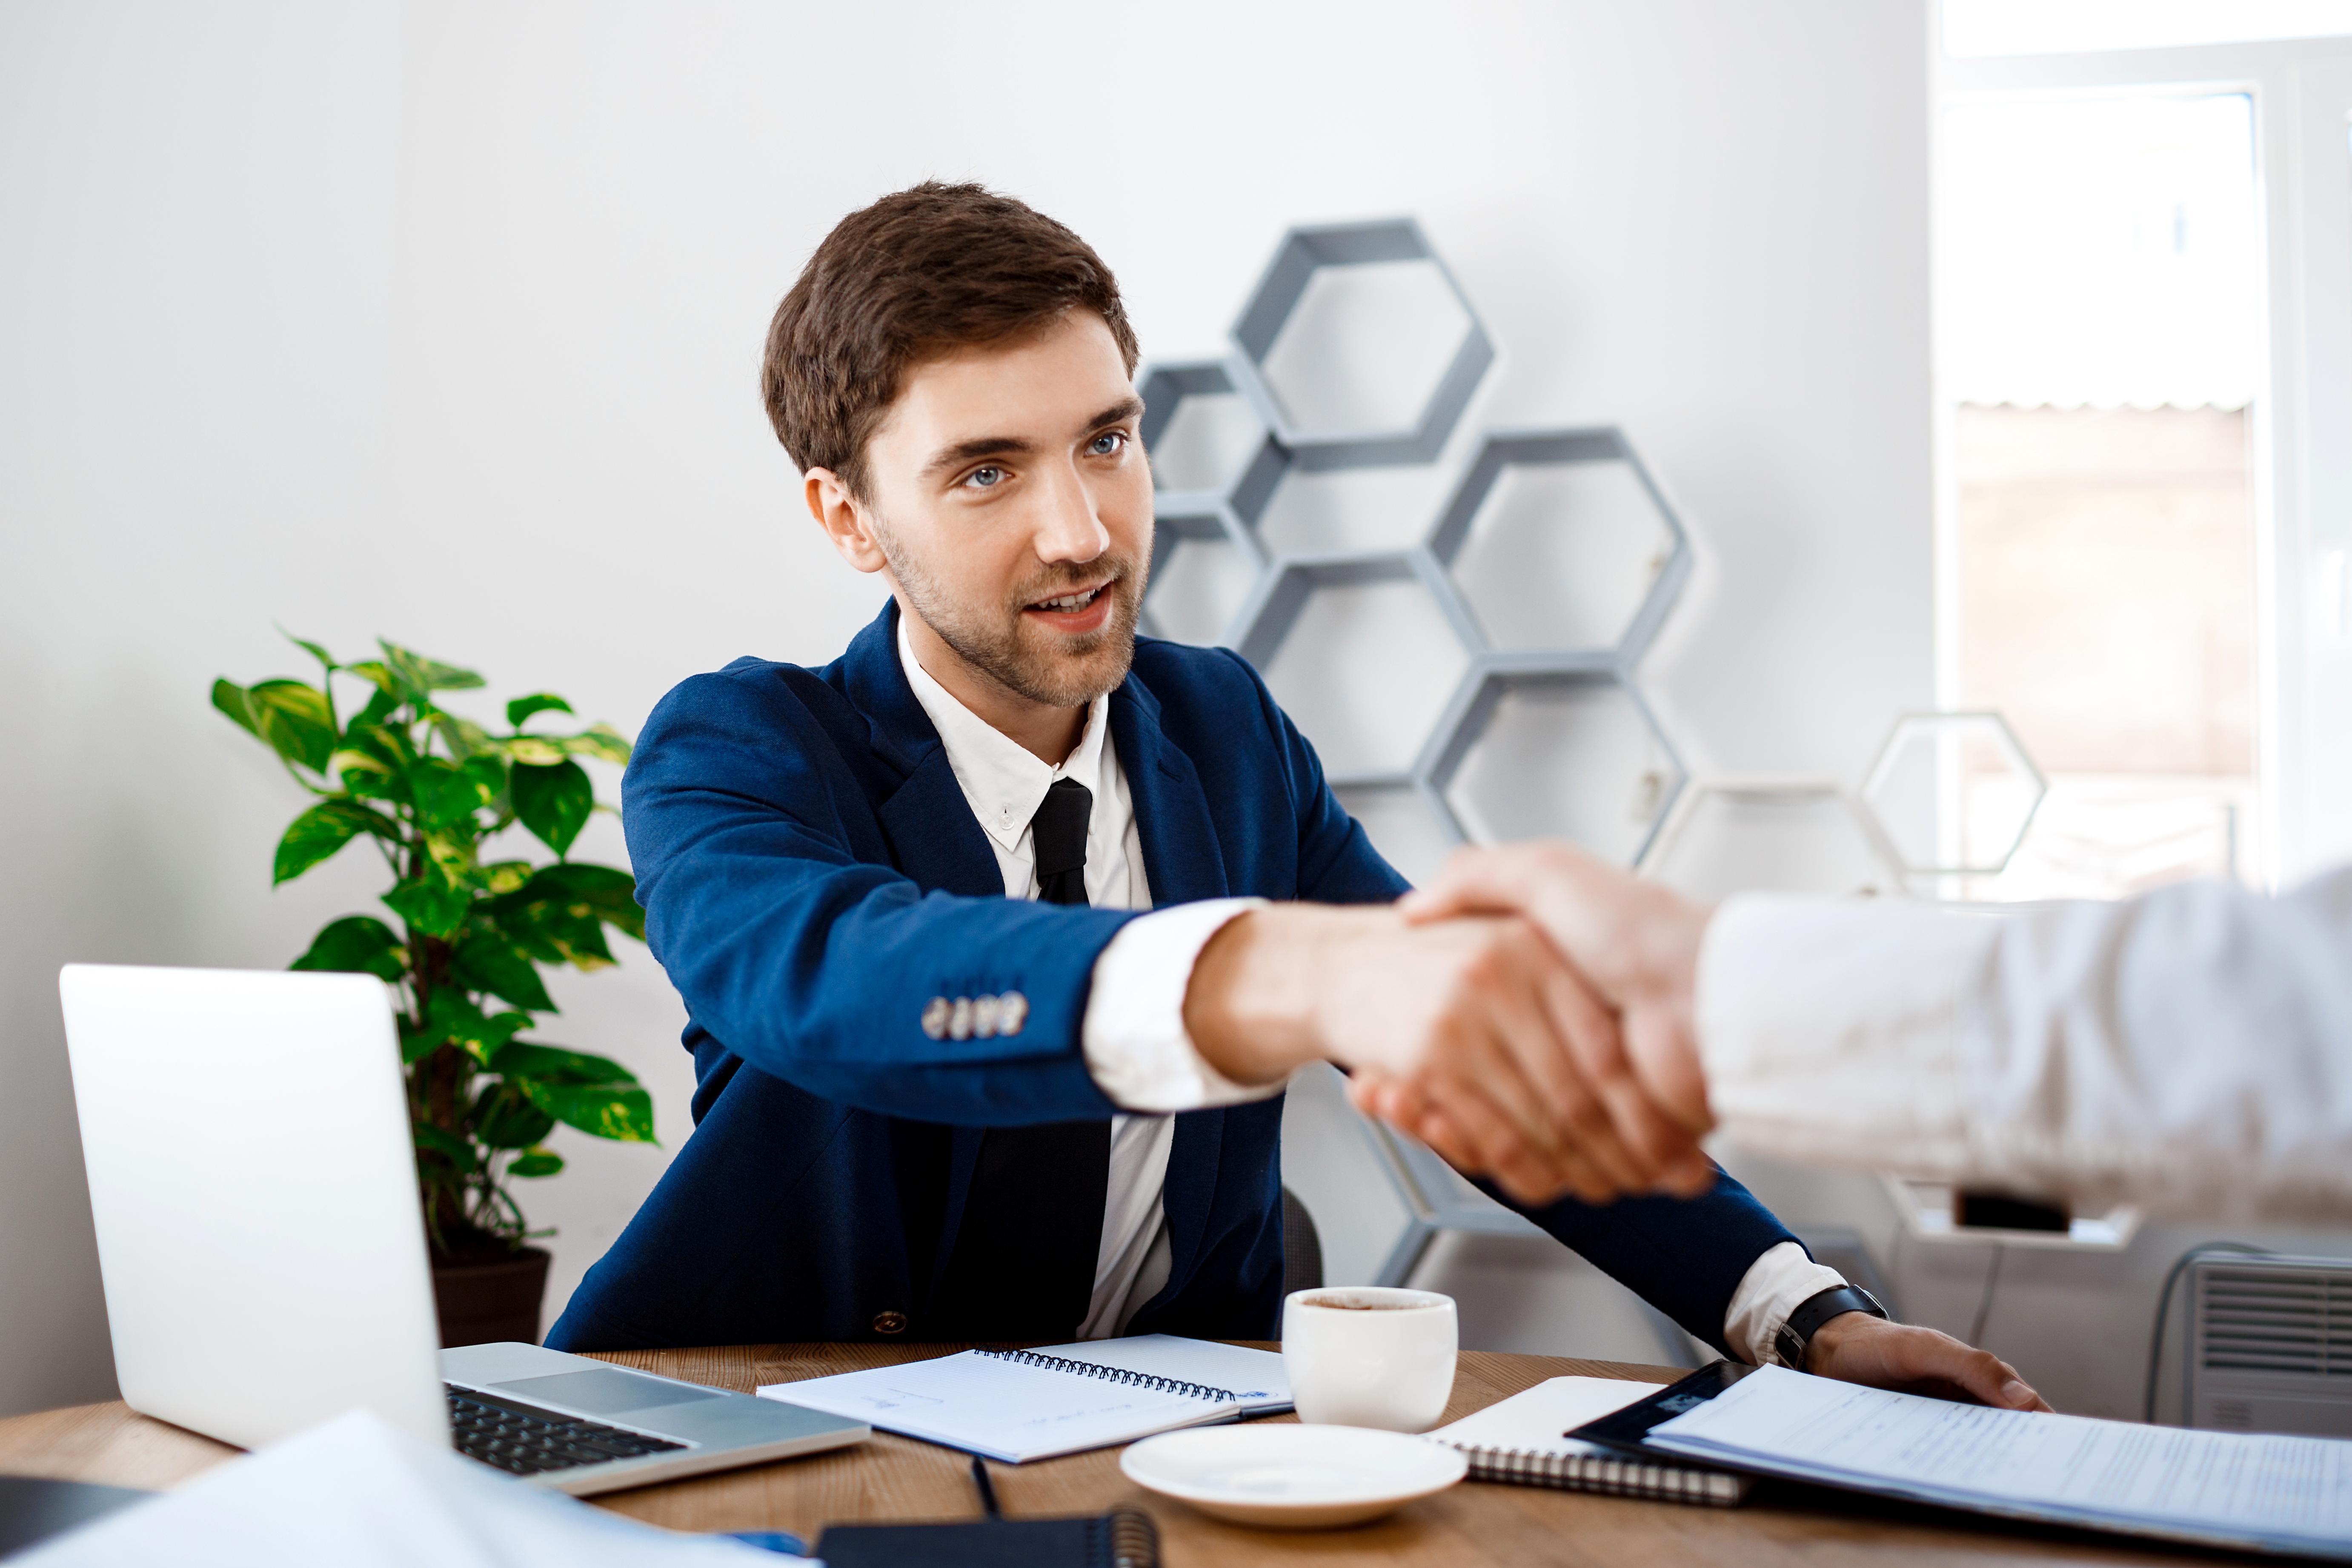 Geschäftstreffen Handschlag